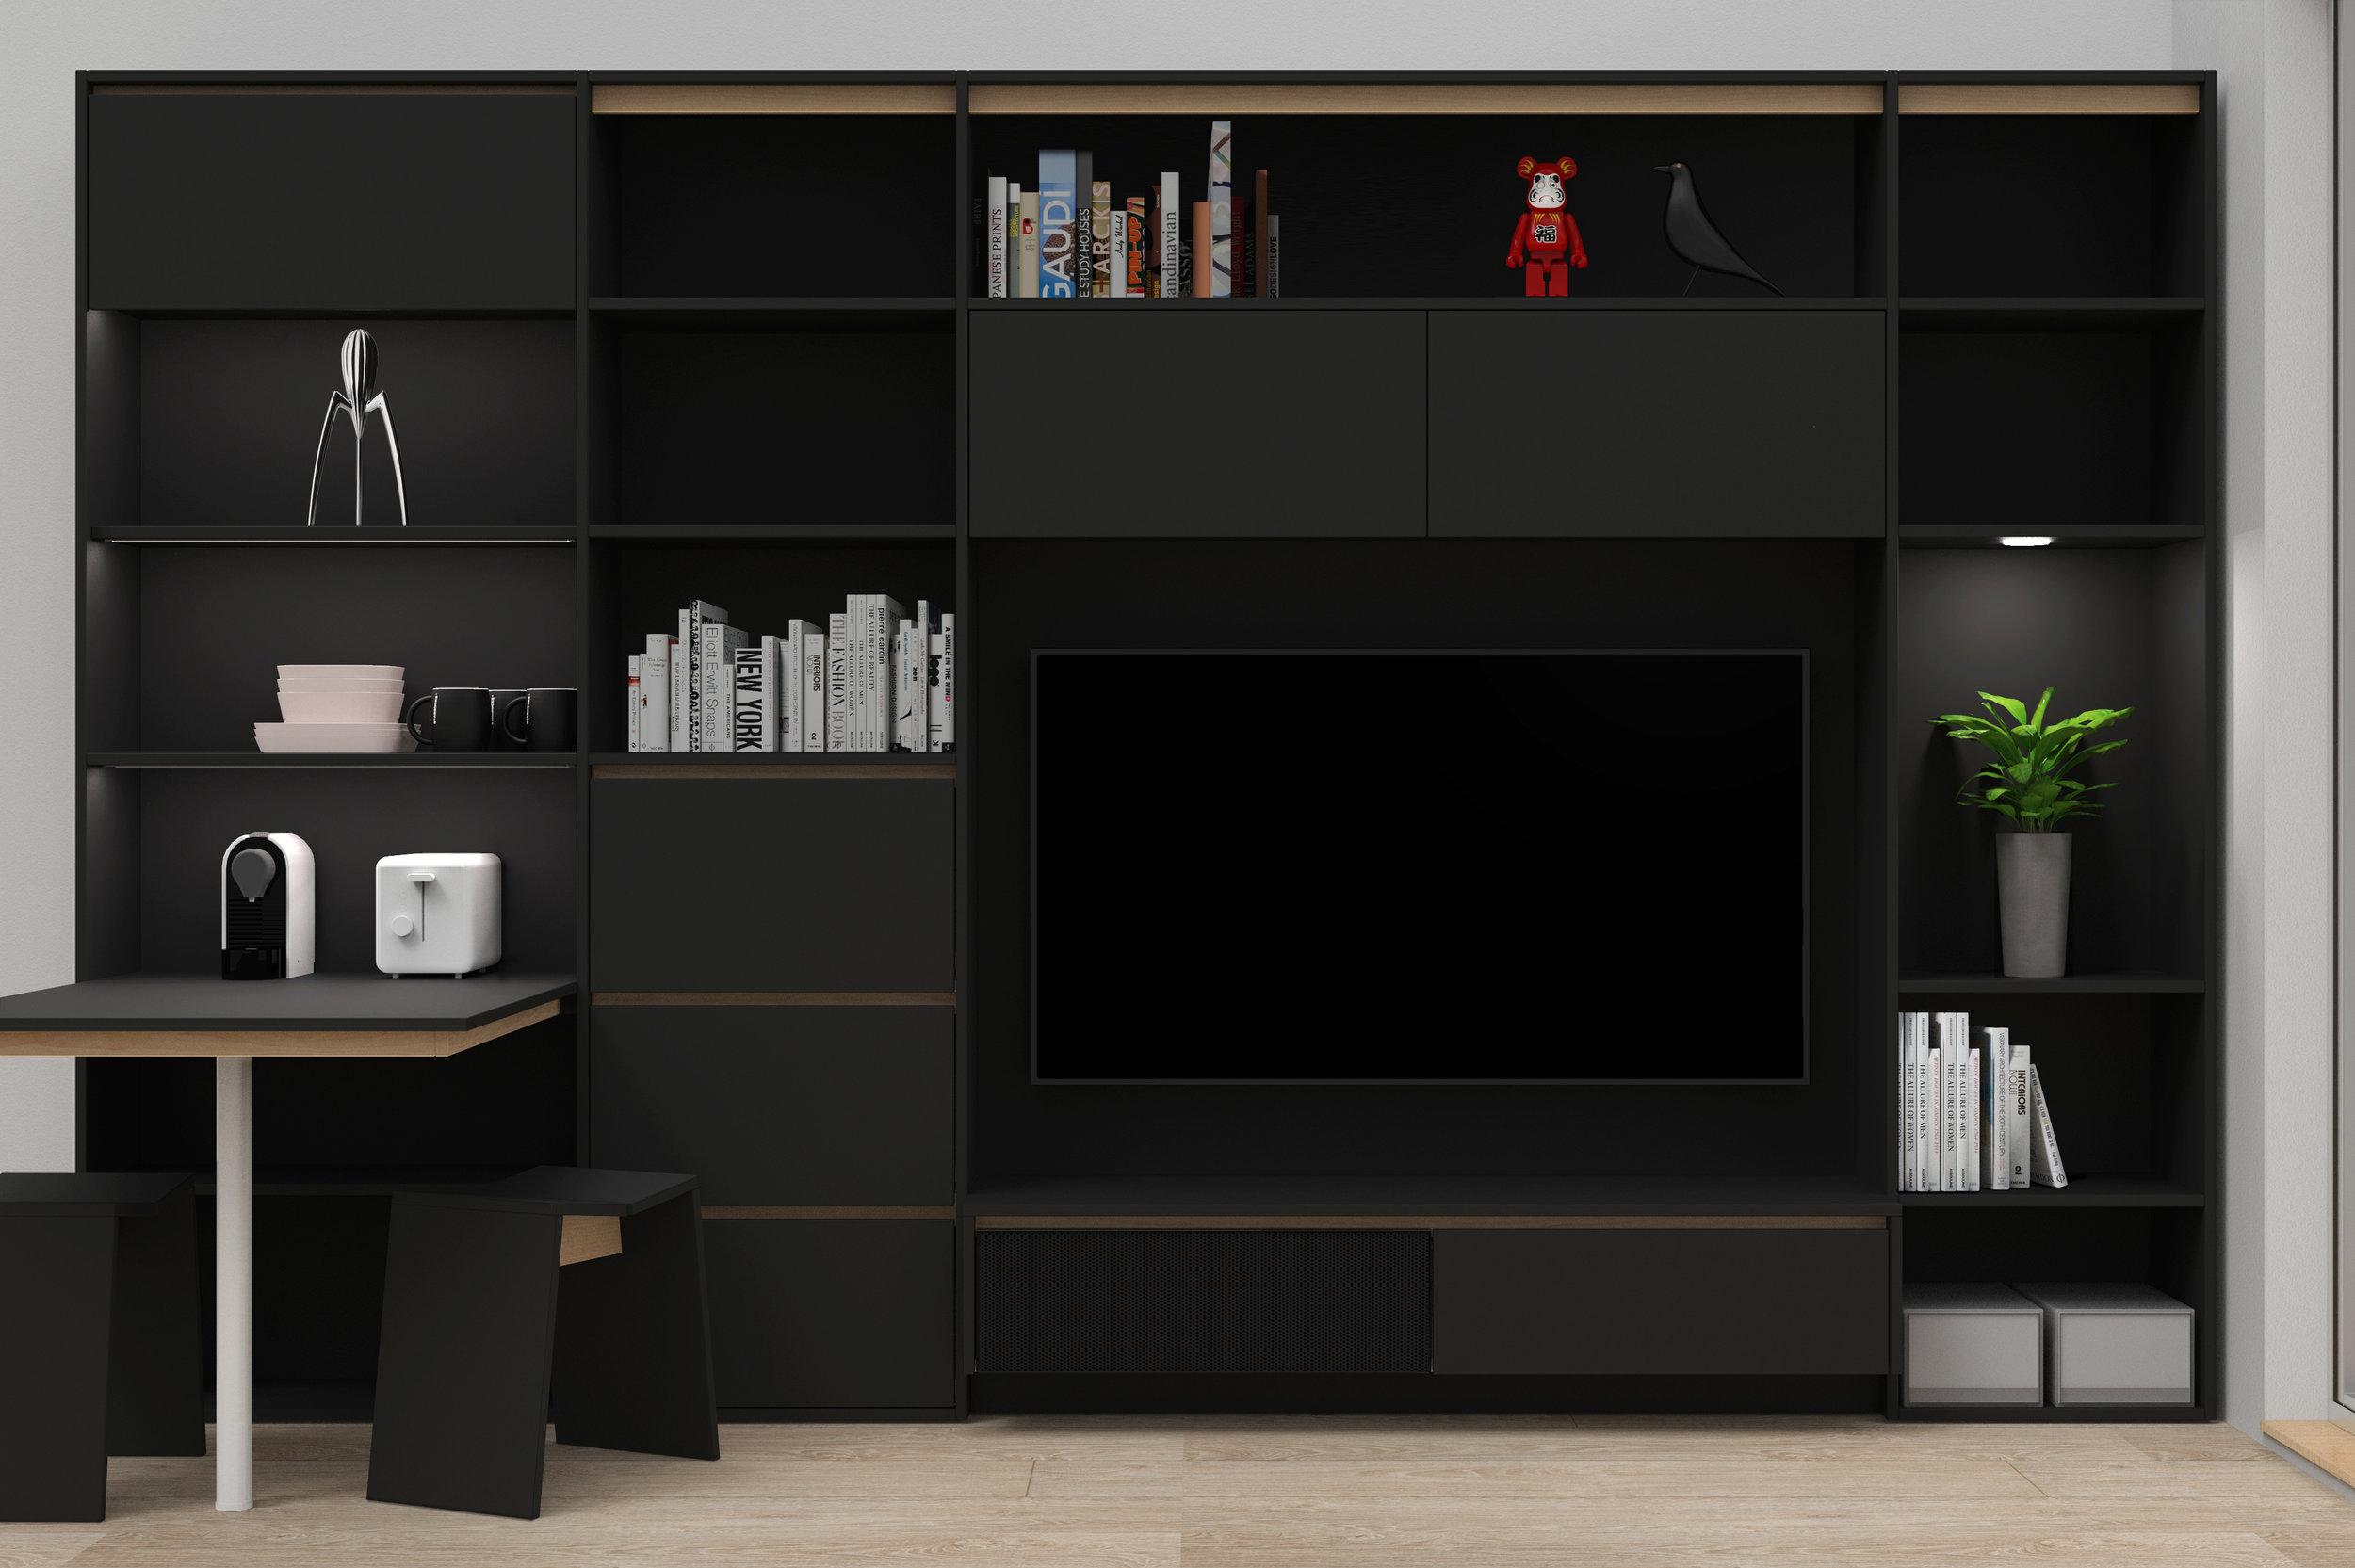 Medai Unit Vancouver Custom Cabinet Work Surface NEXUS.jpg